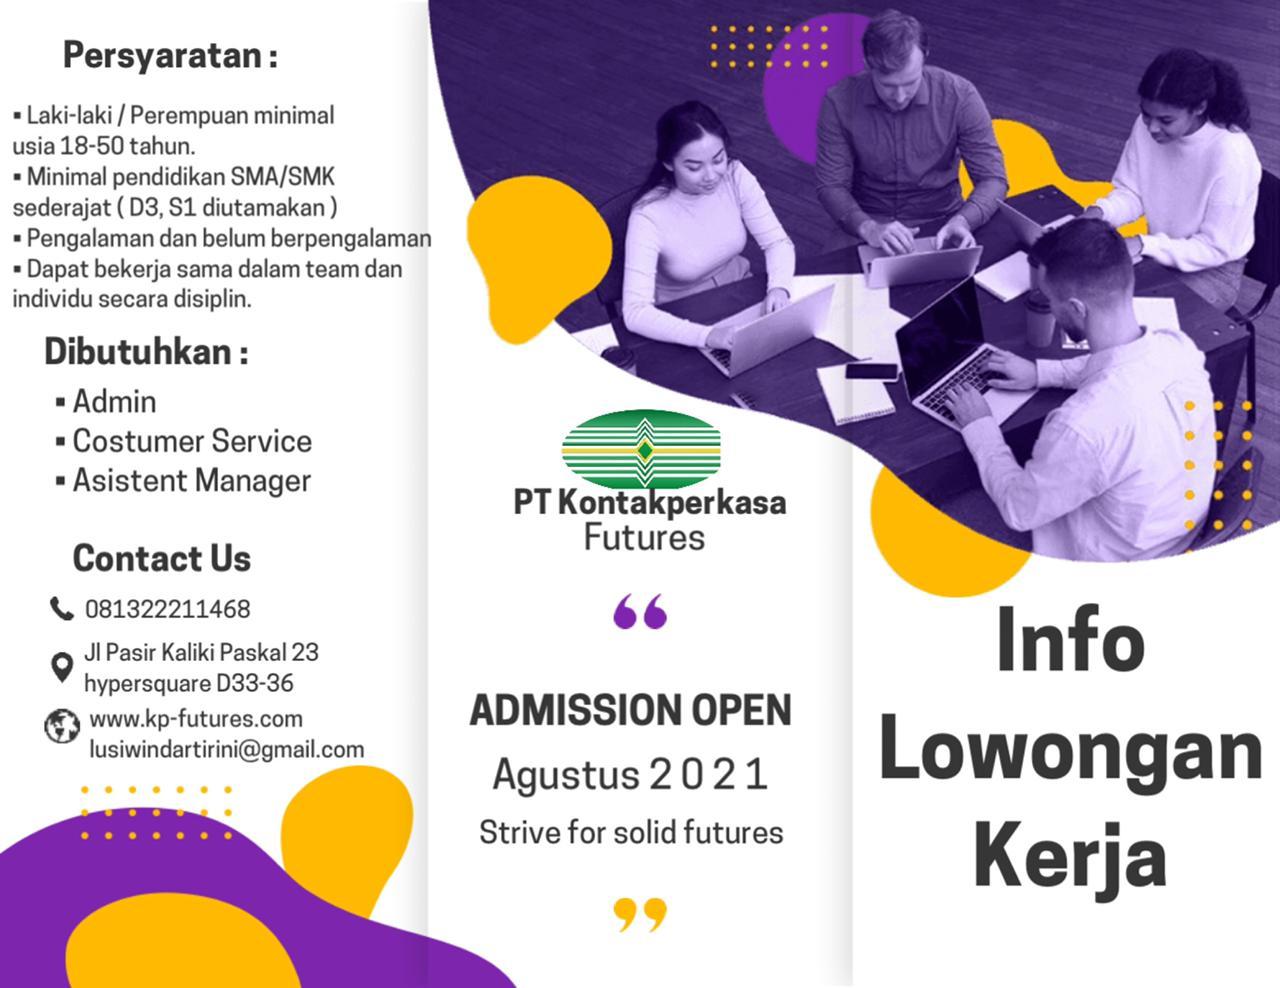 Lowongan Kerja PT. Kontak Perkasa Futures Bandung Agustus 2021